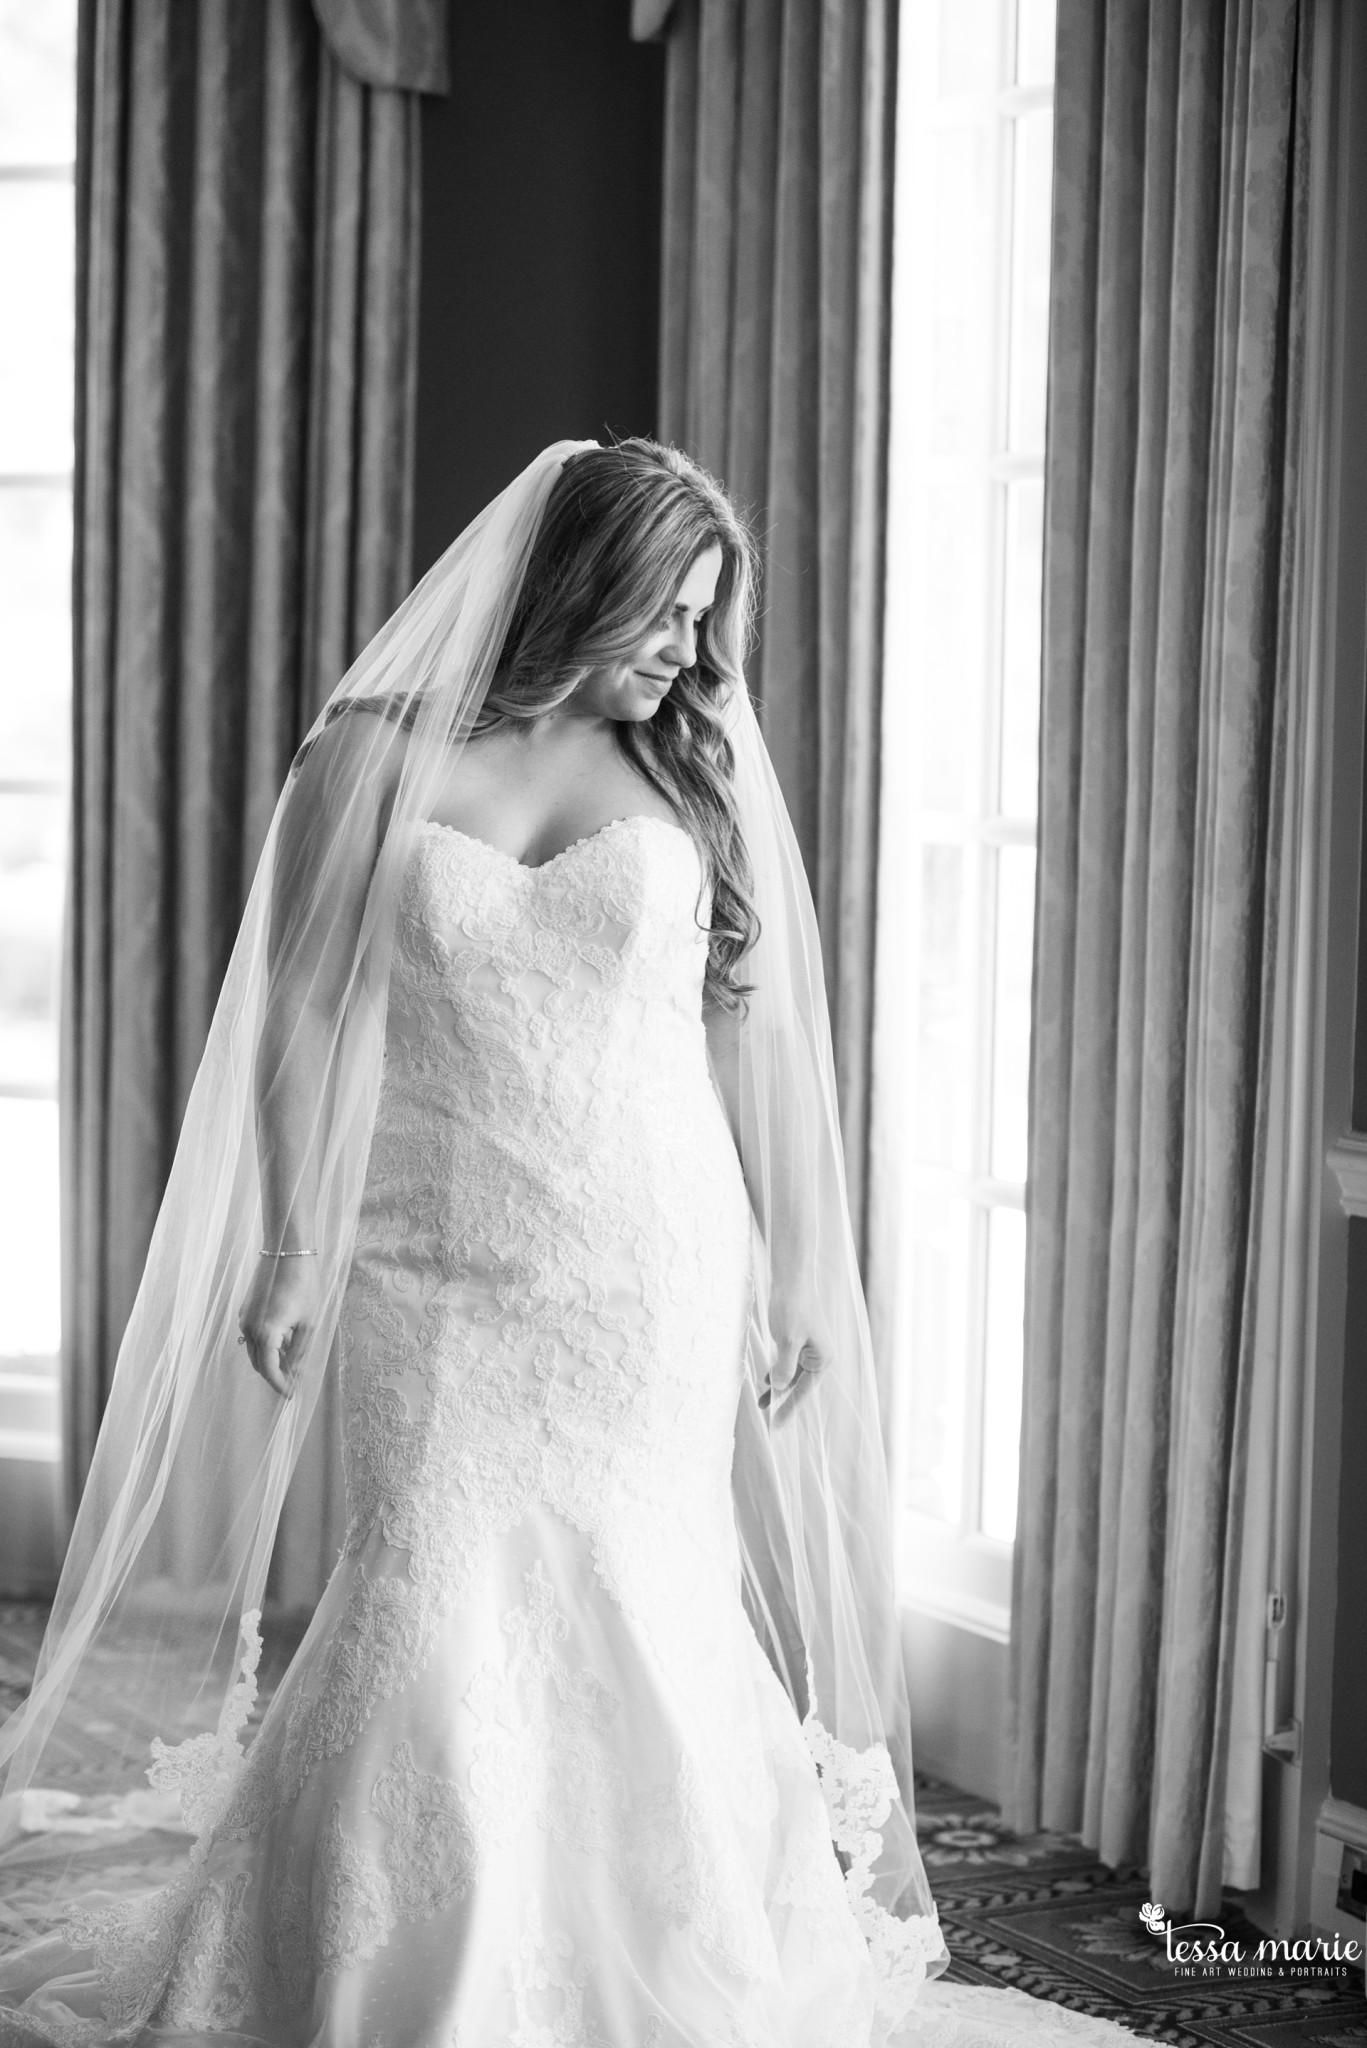 tessa_marie_legacy_moments_storytelling_candid_emotionally_driven_wedding_photographer_atlanta_wedding_photography_st_ives_country_club_wedding_boukates_bridals_by_lori_0002